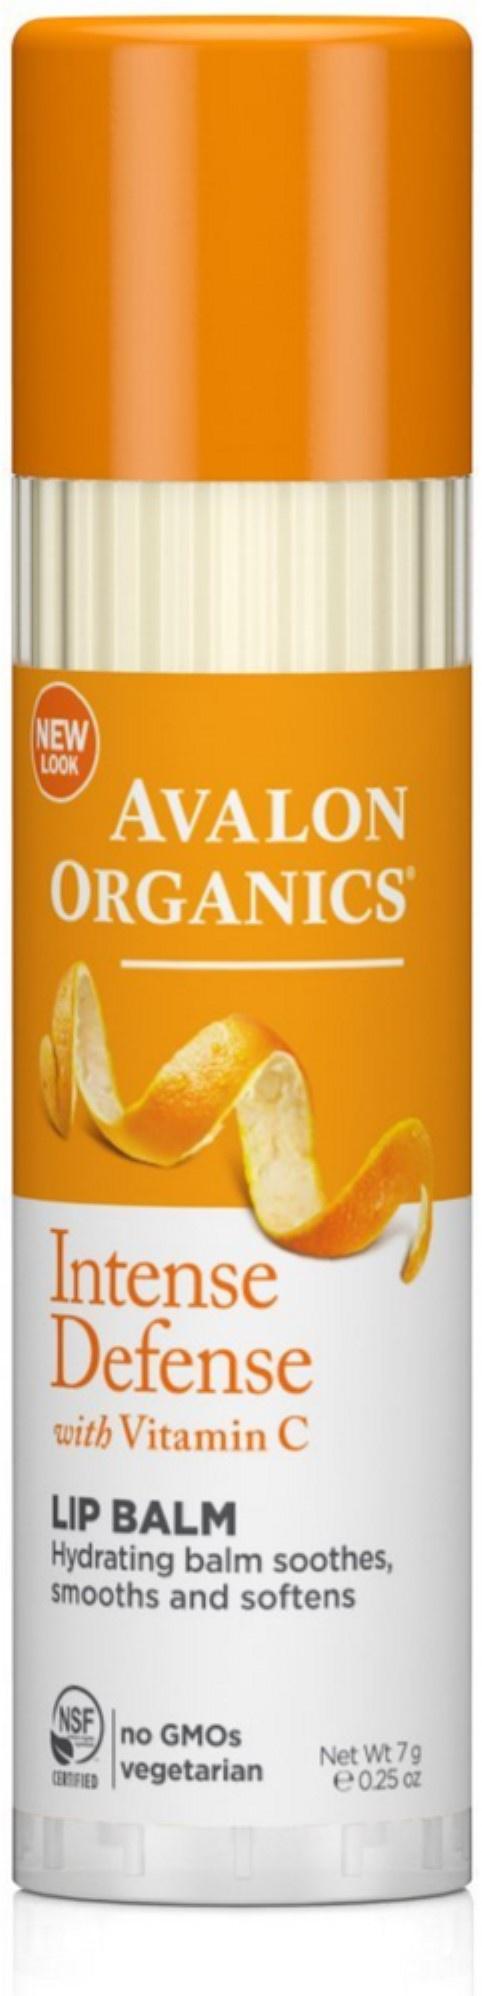 Avalon Organics Intense Defense Lip Balm